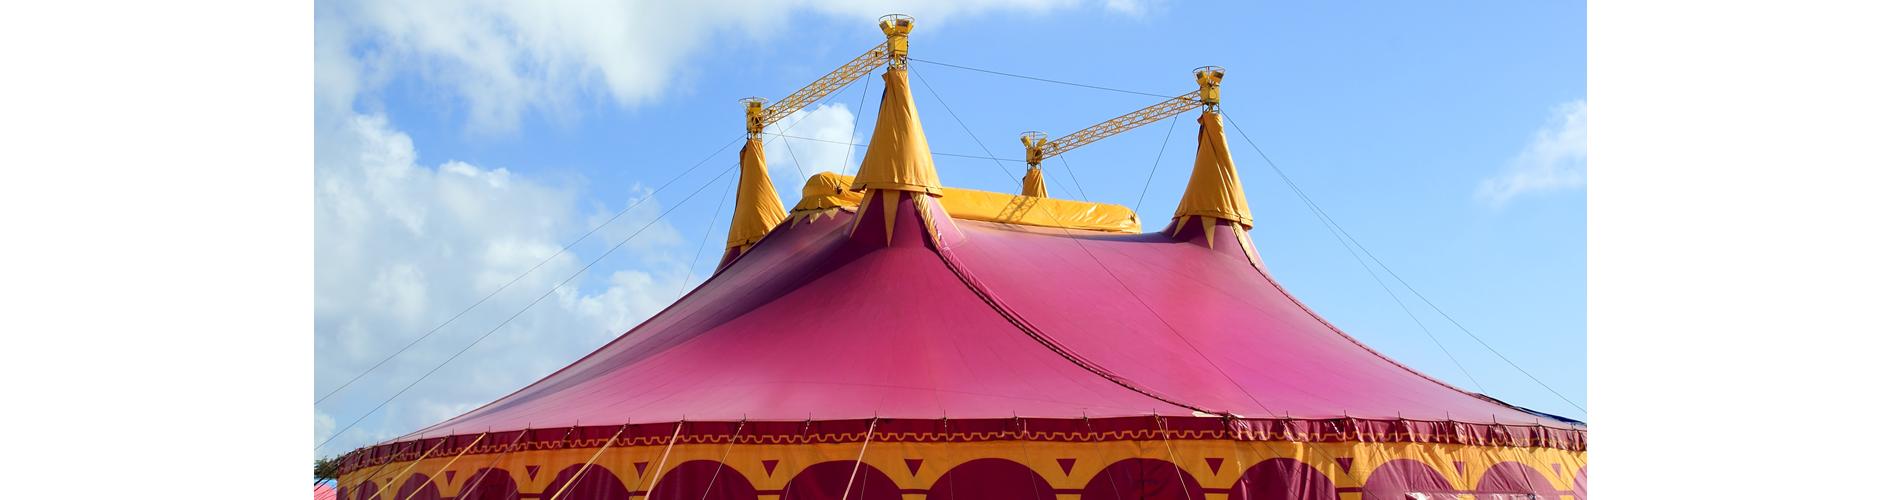 Big Top | Circus Stardust Entertainment